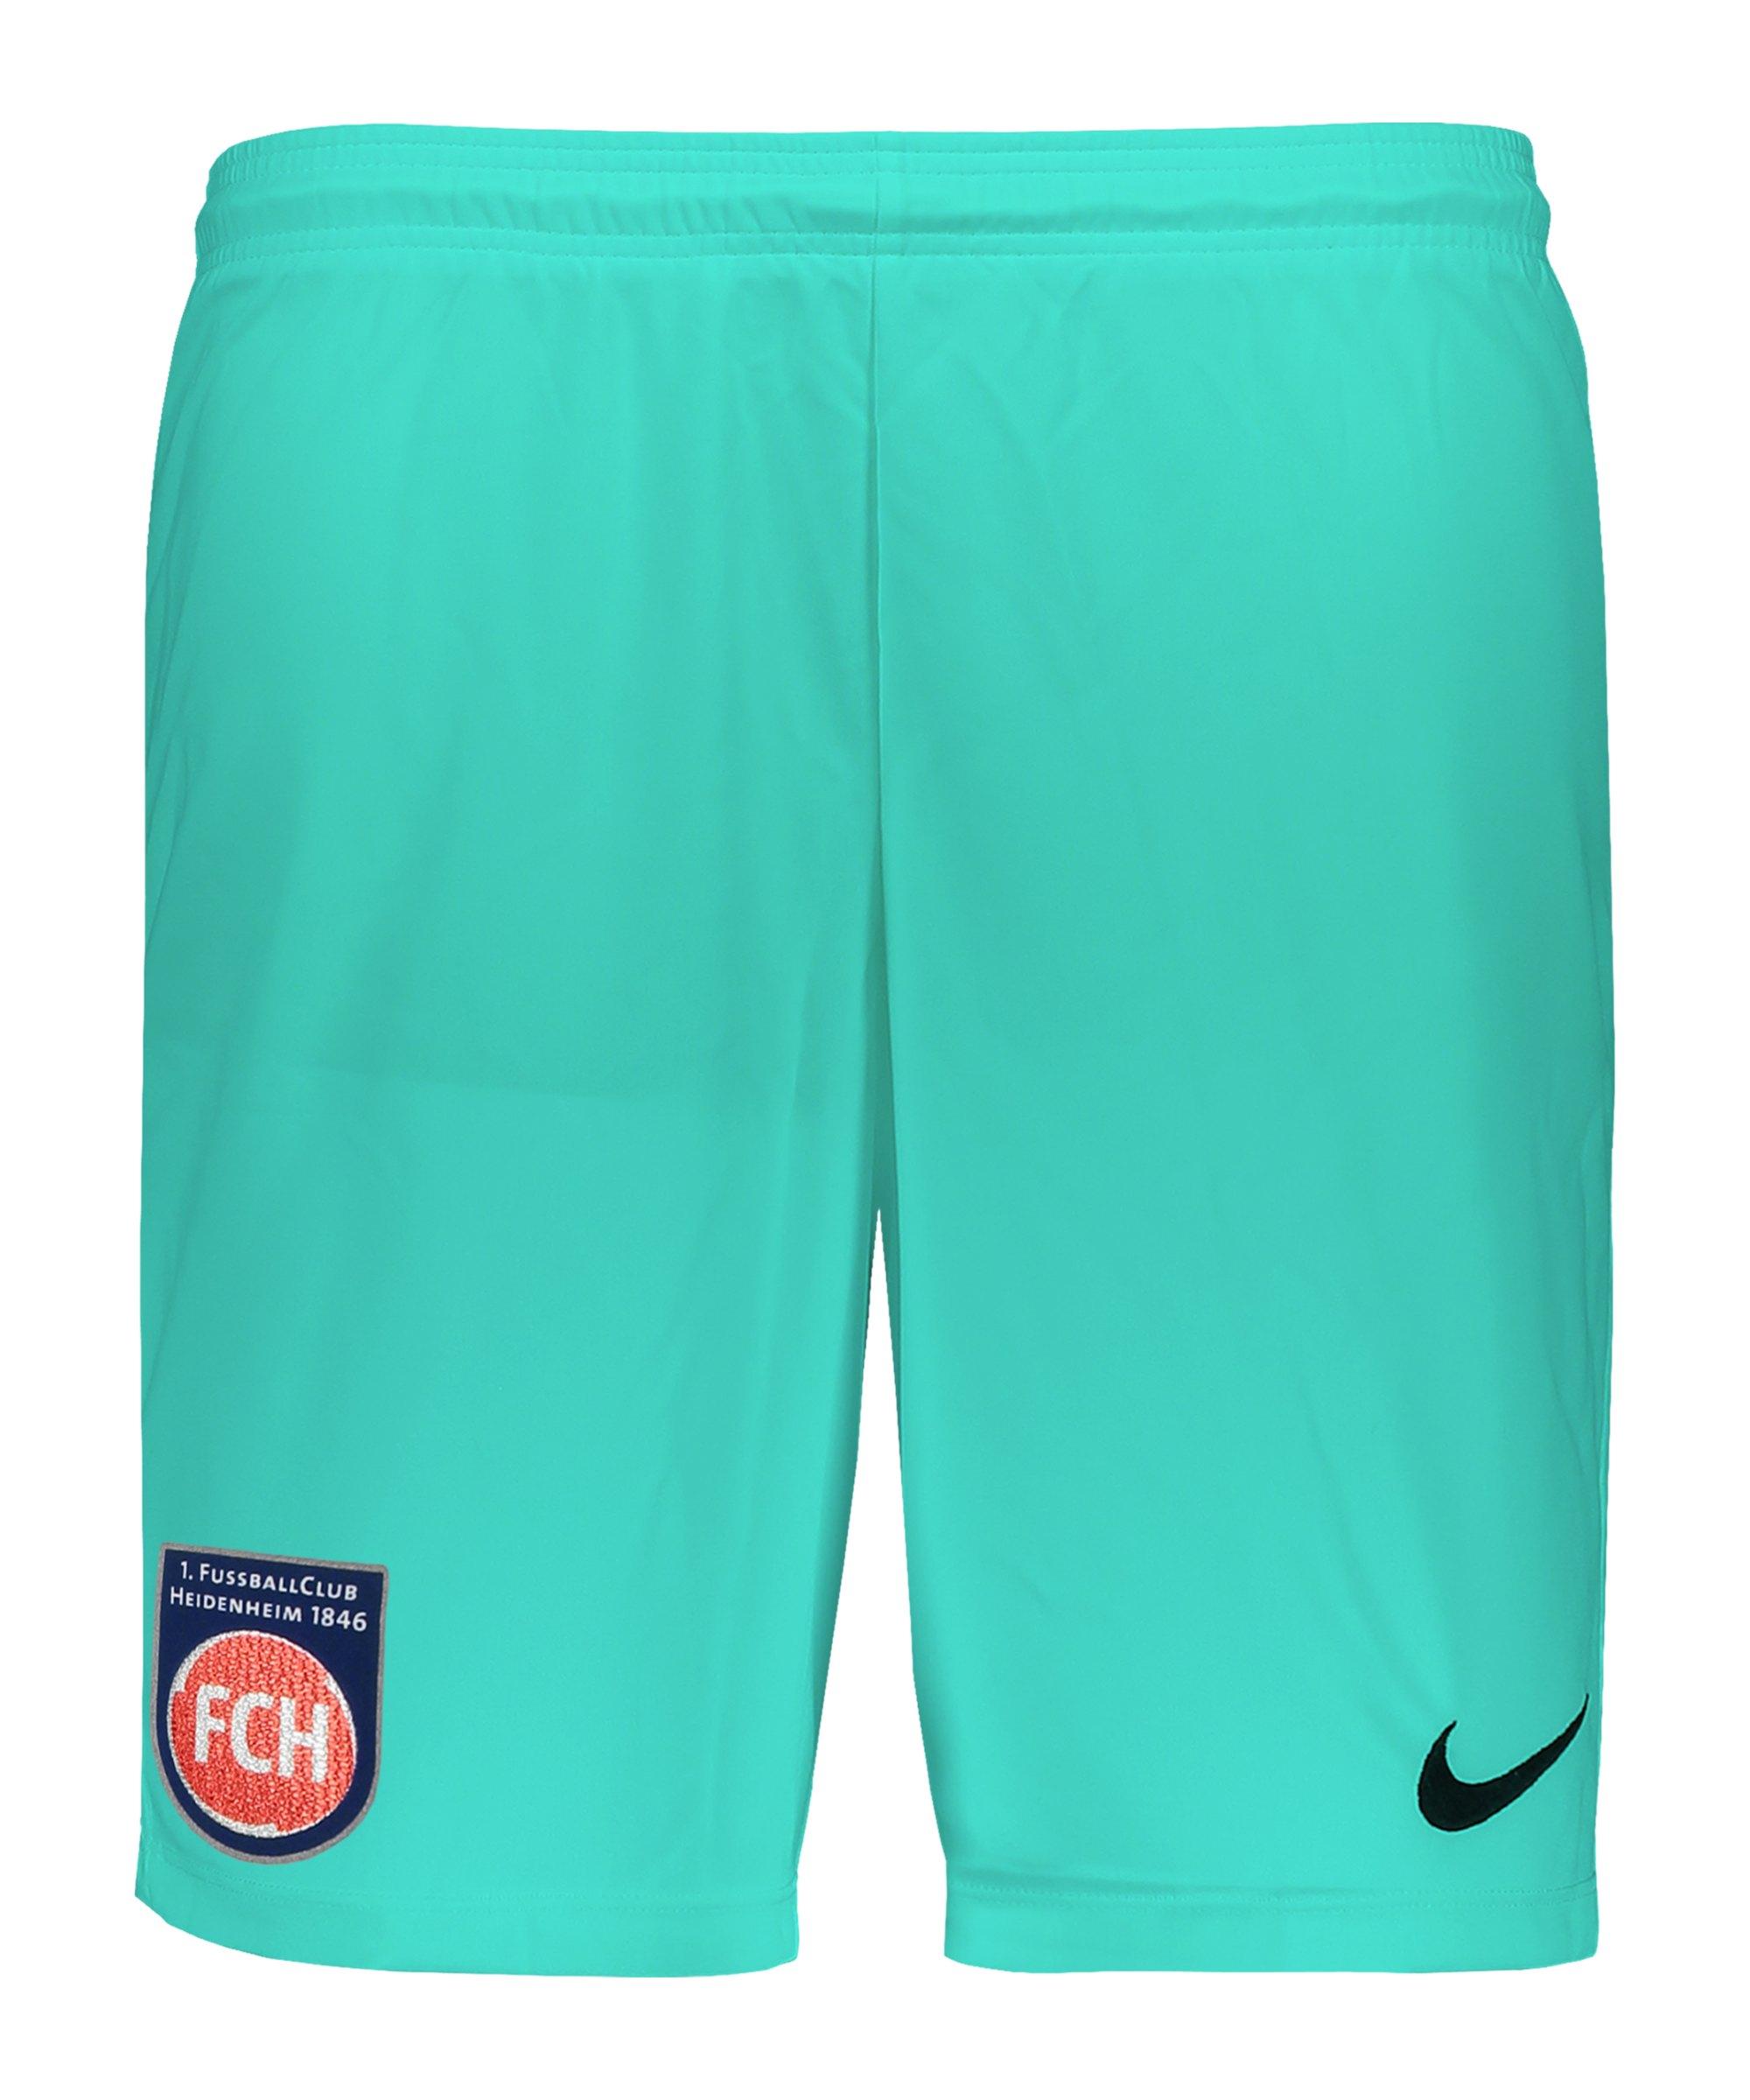 Nike 1. FC Heidenheim Torwartshort 2020/2021 Kids Grün F354 - gruen